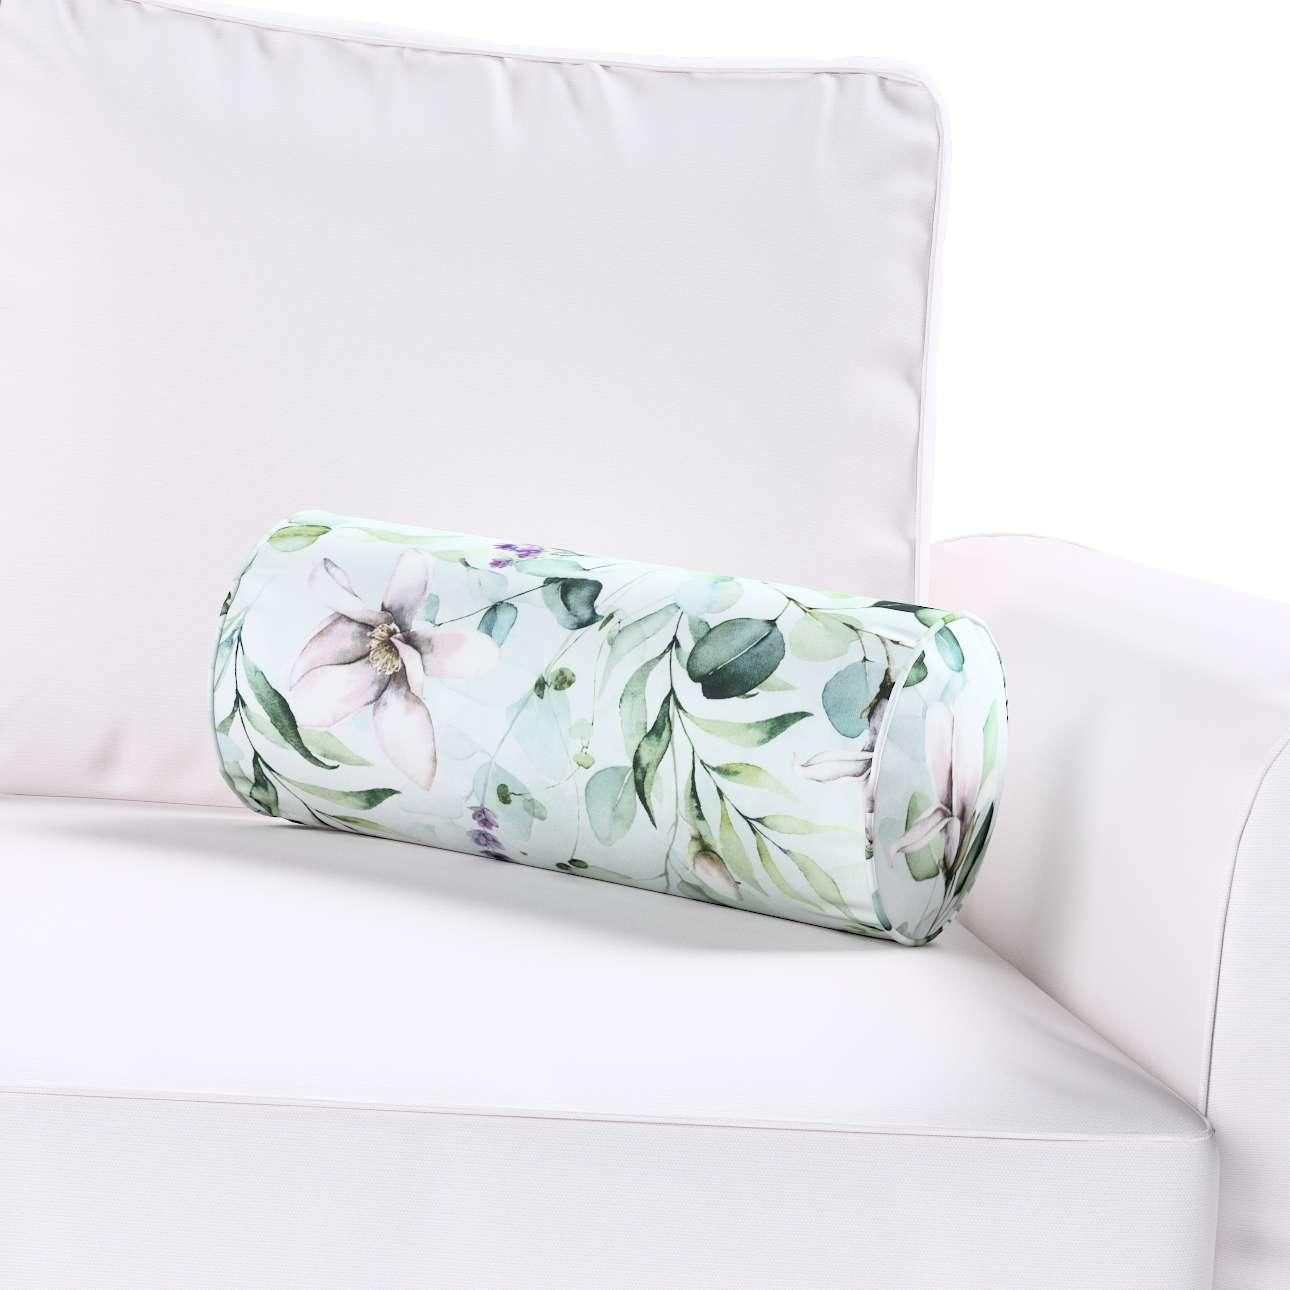 Valček jednoduchý V kolekcii Flowers, tkanina: 143-66